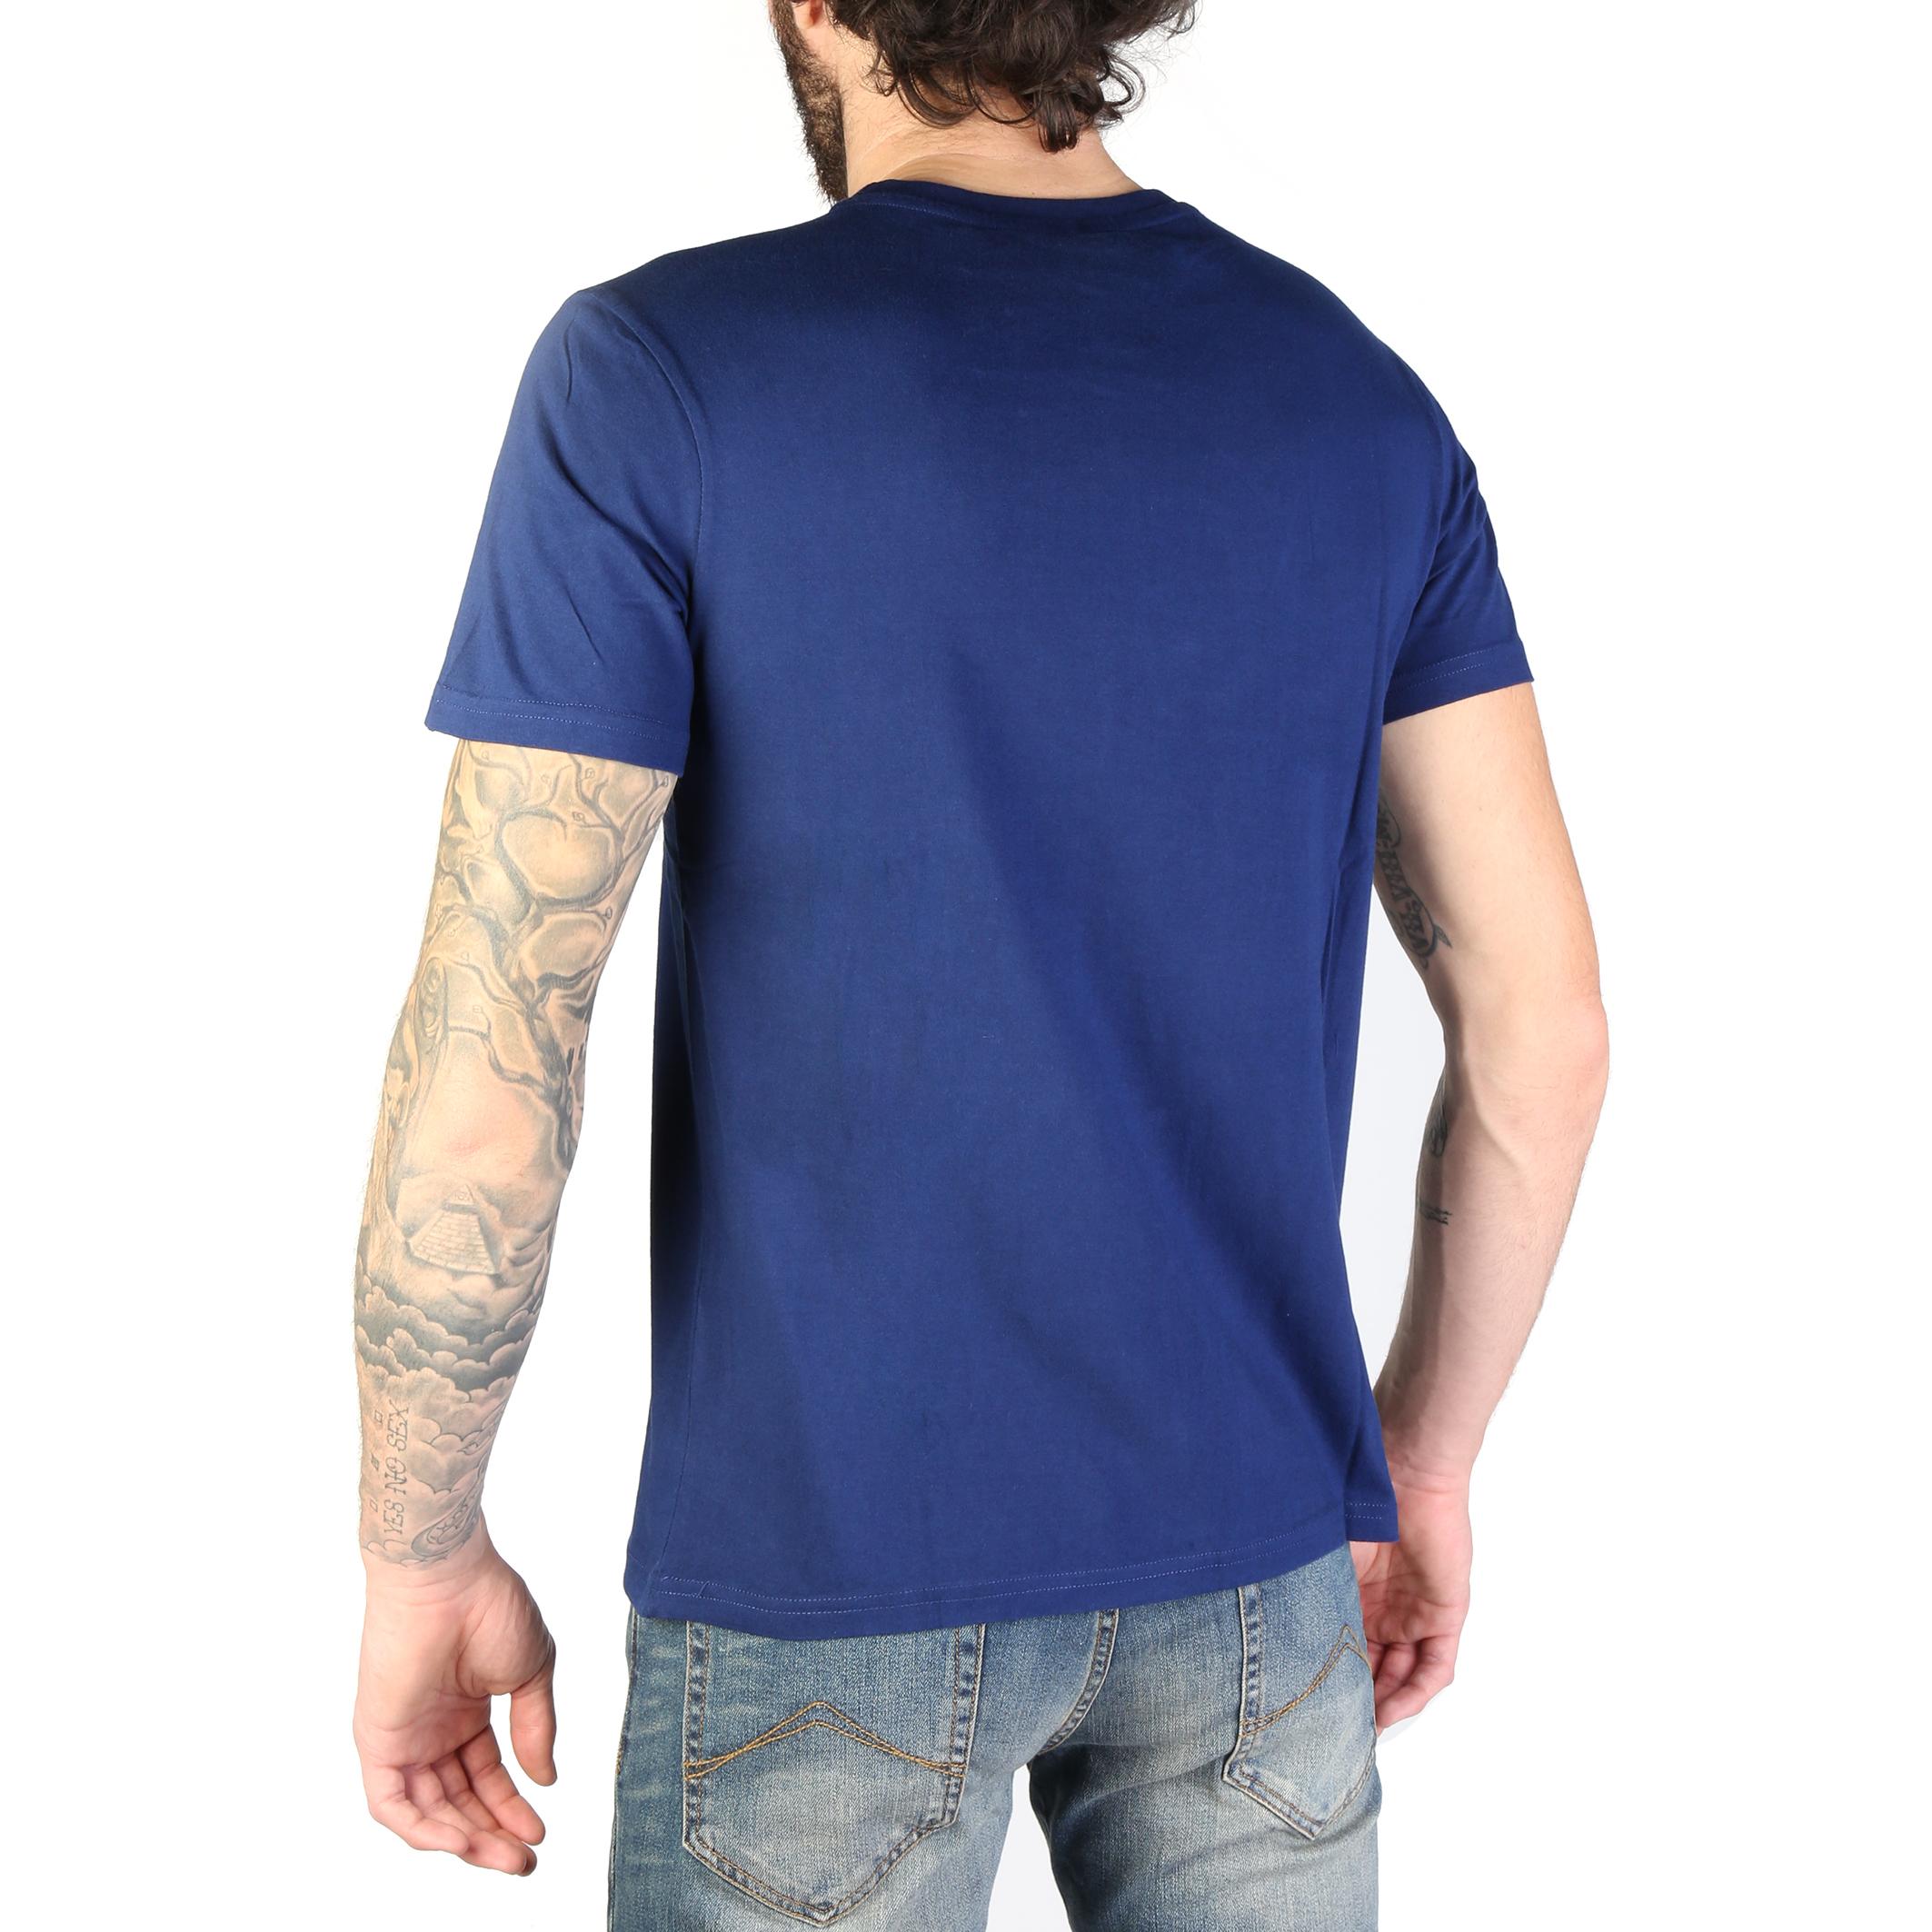 T-shirts Carrera Jeans Homme 00801B 00801B 00801B 0045X, Bleu/Bleu 9148f3